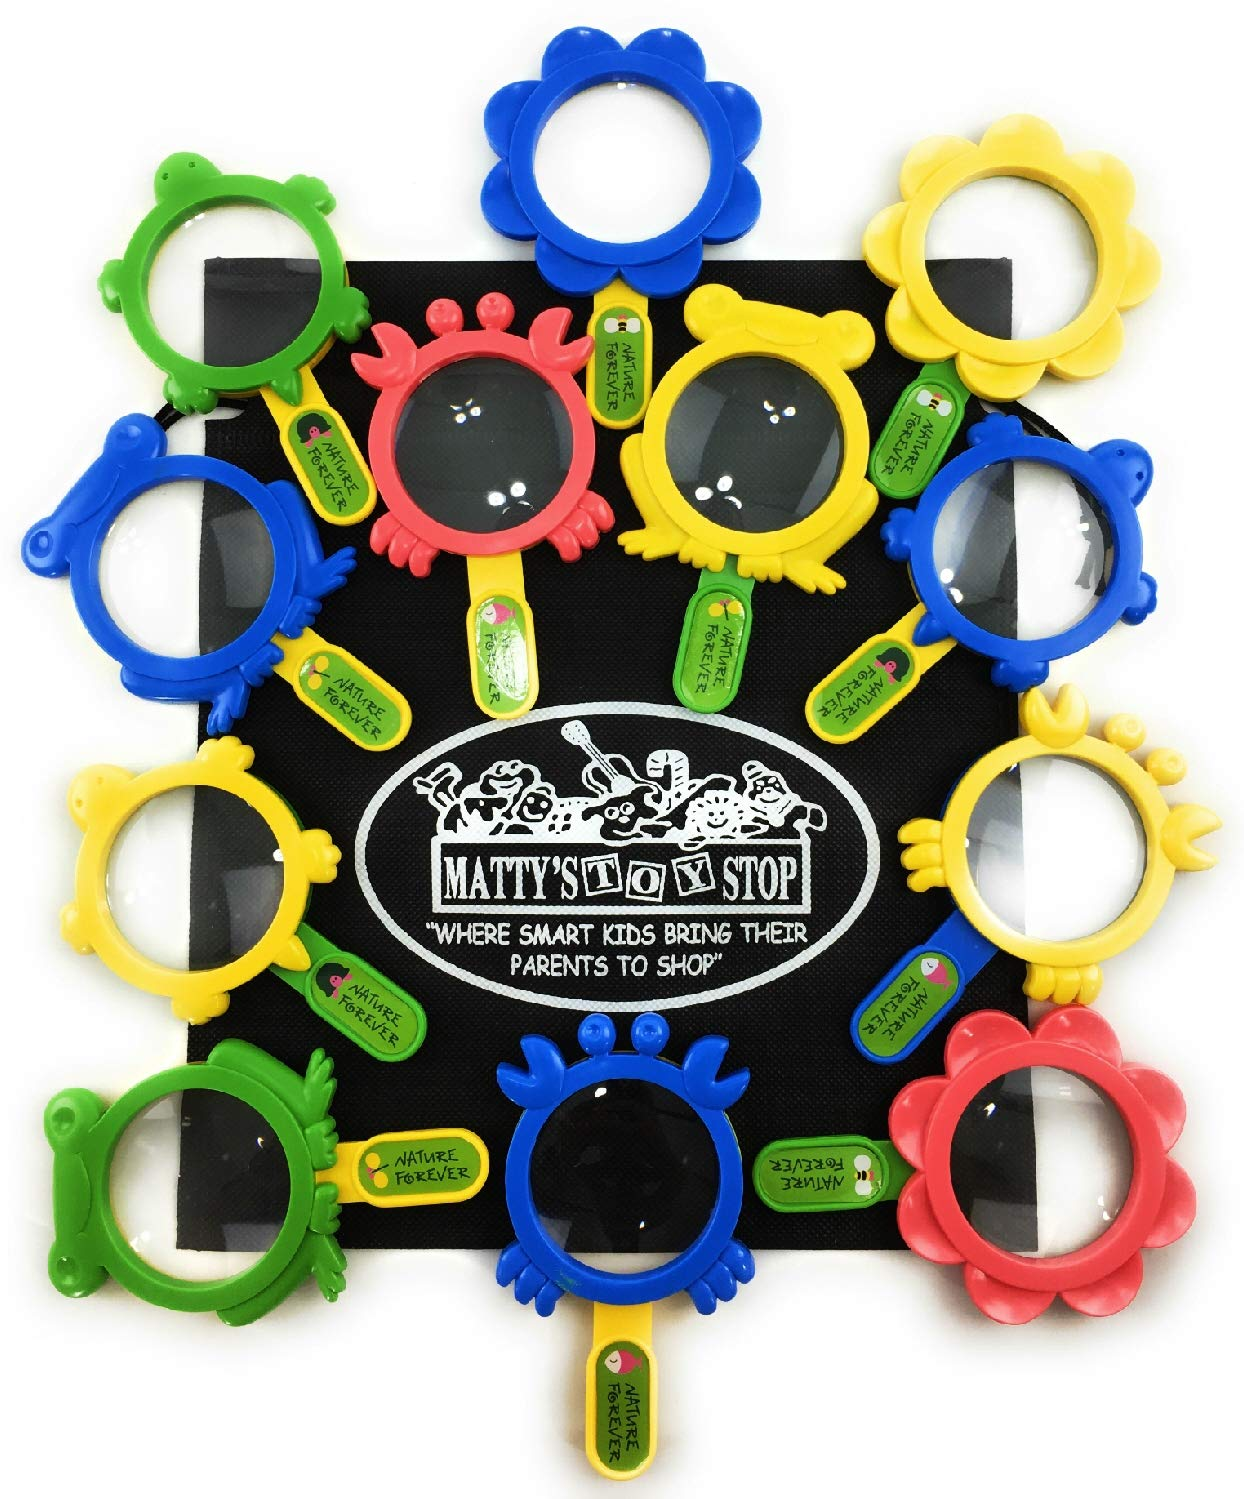 Schylling Plastic Magnifying Lens (5'') Complete Bulk Classroom/Party Favor Set Featuring Turtle, Crab, Flower & Frog Designs...Plus Bonus Matty's Toy Stop Storage Bag - 12 Pack